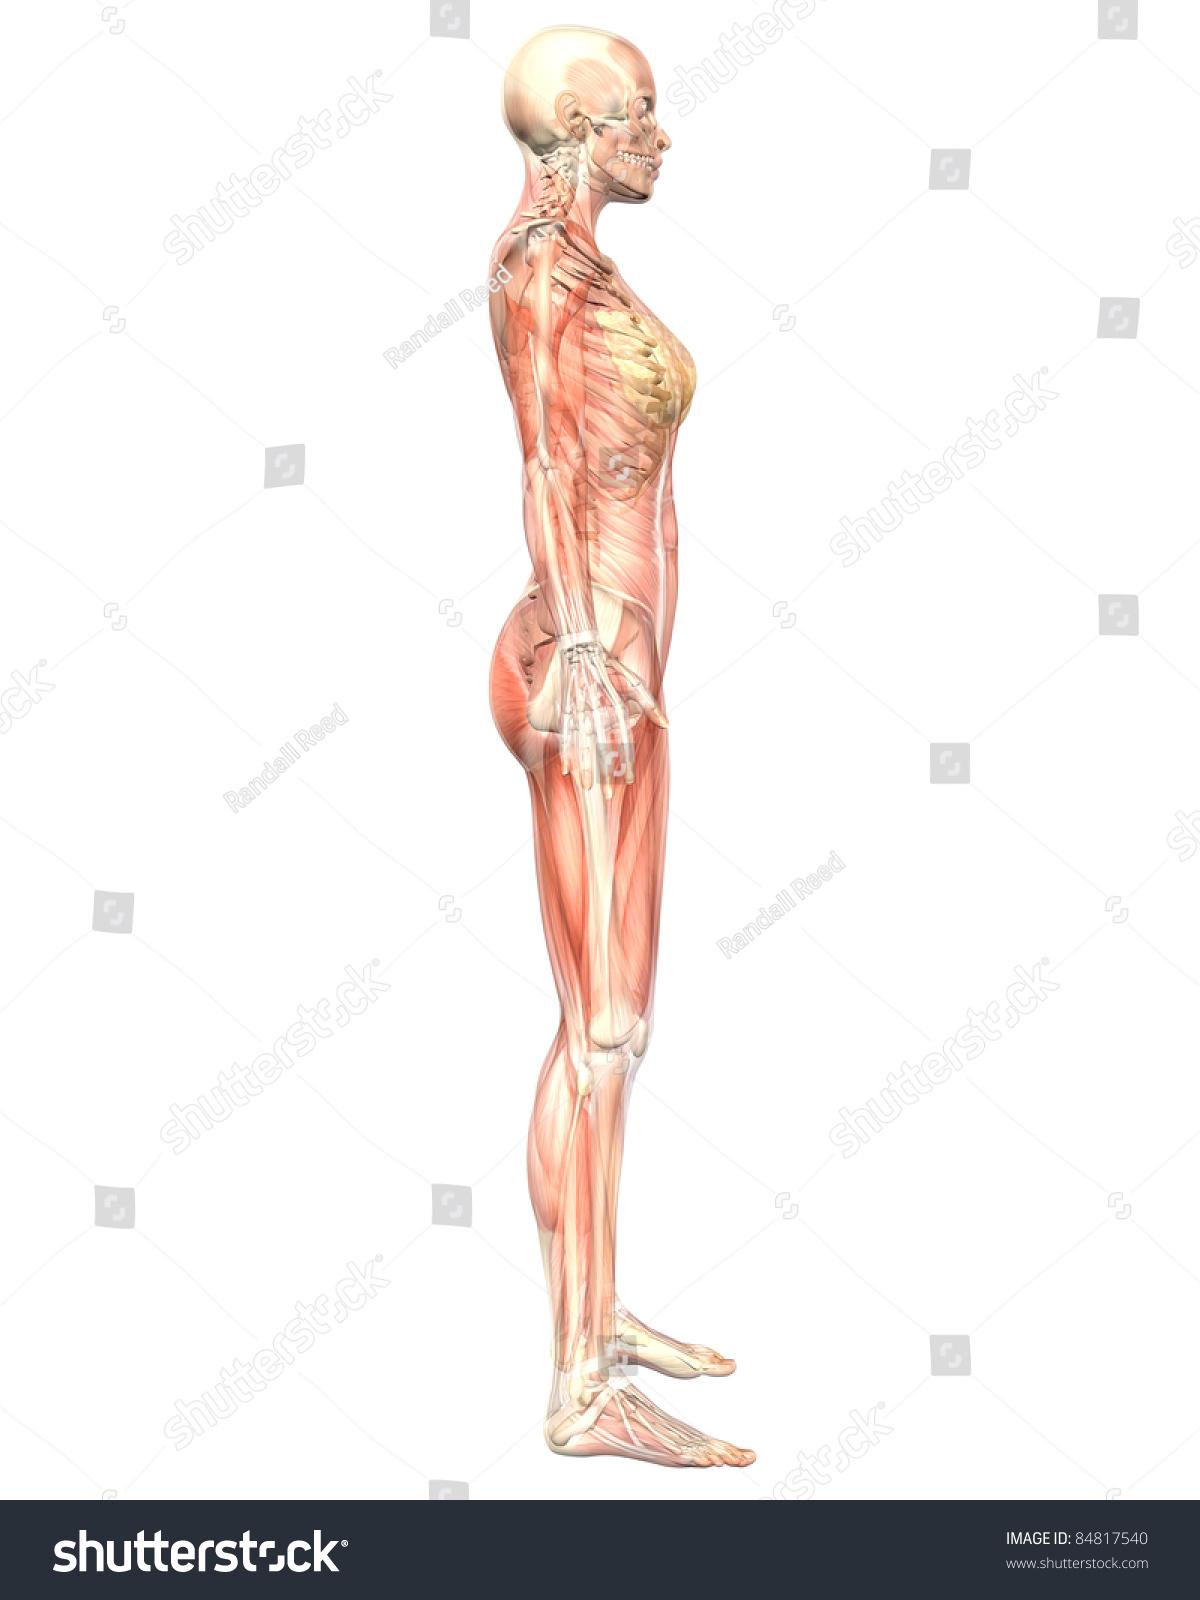 Illustration Side View Female Muscular Anatomy Stock Illustration ...